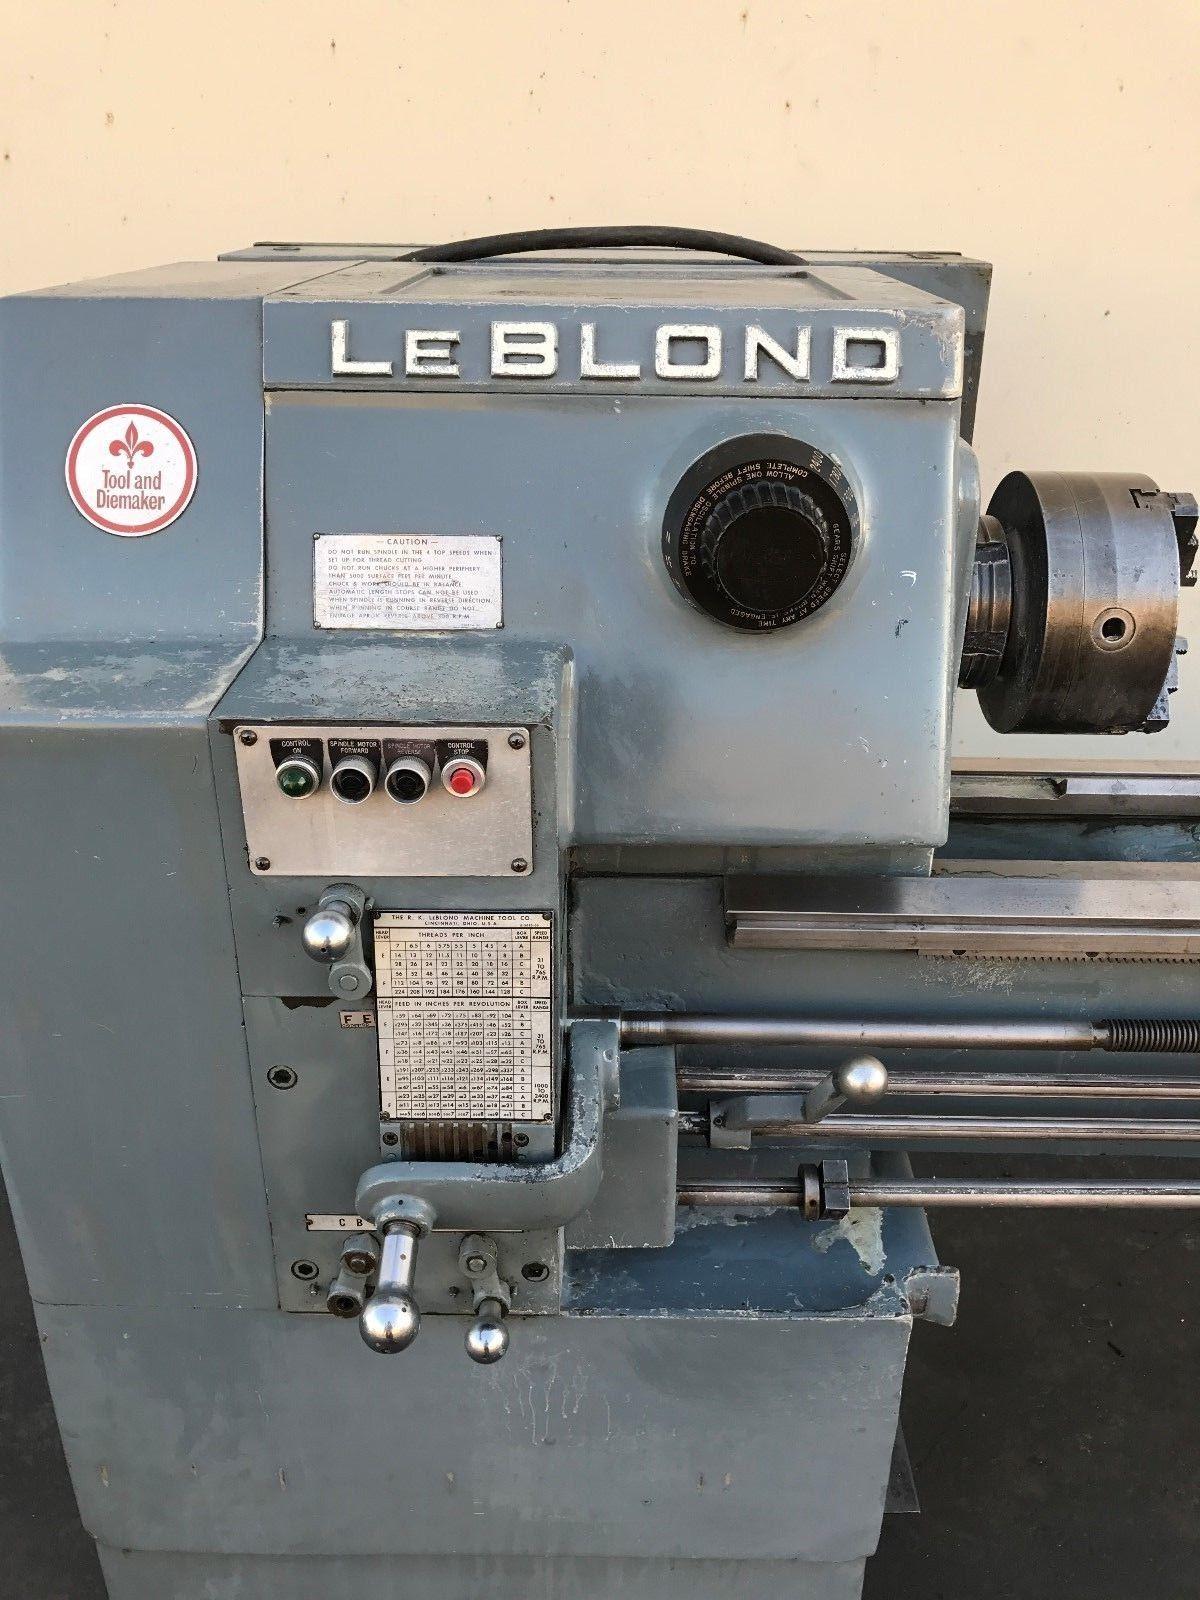 Leblond Tool Die Maker 14X54 Geared Head Engine Lathe